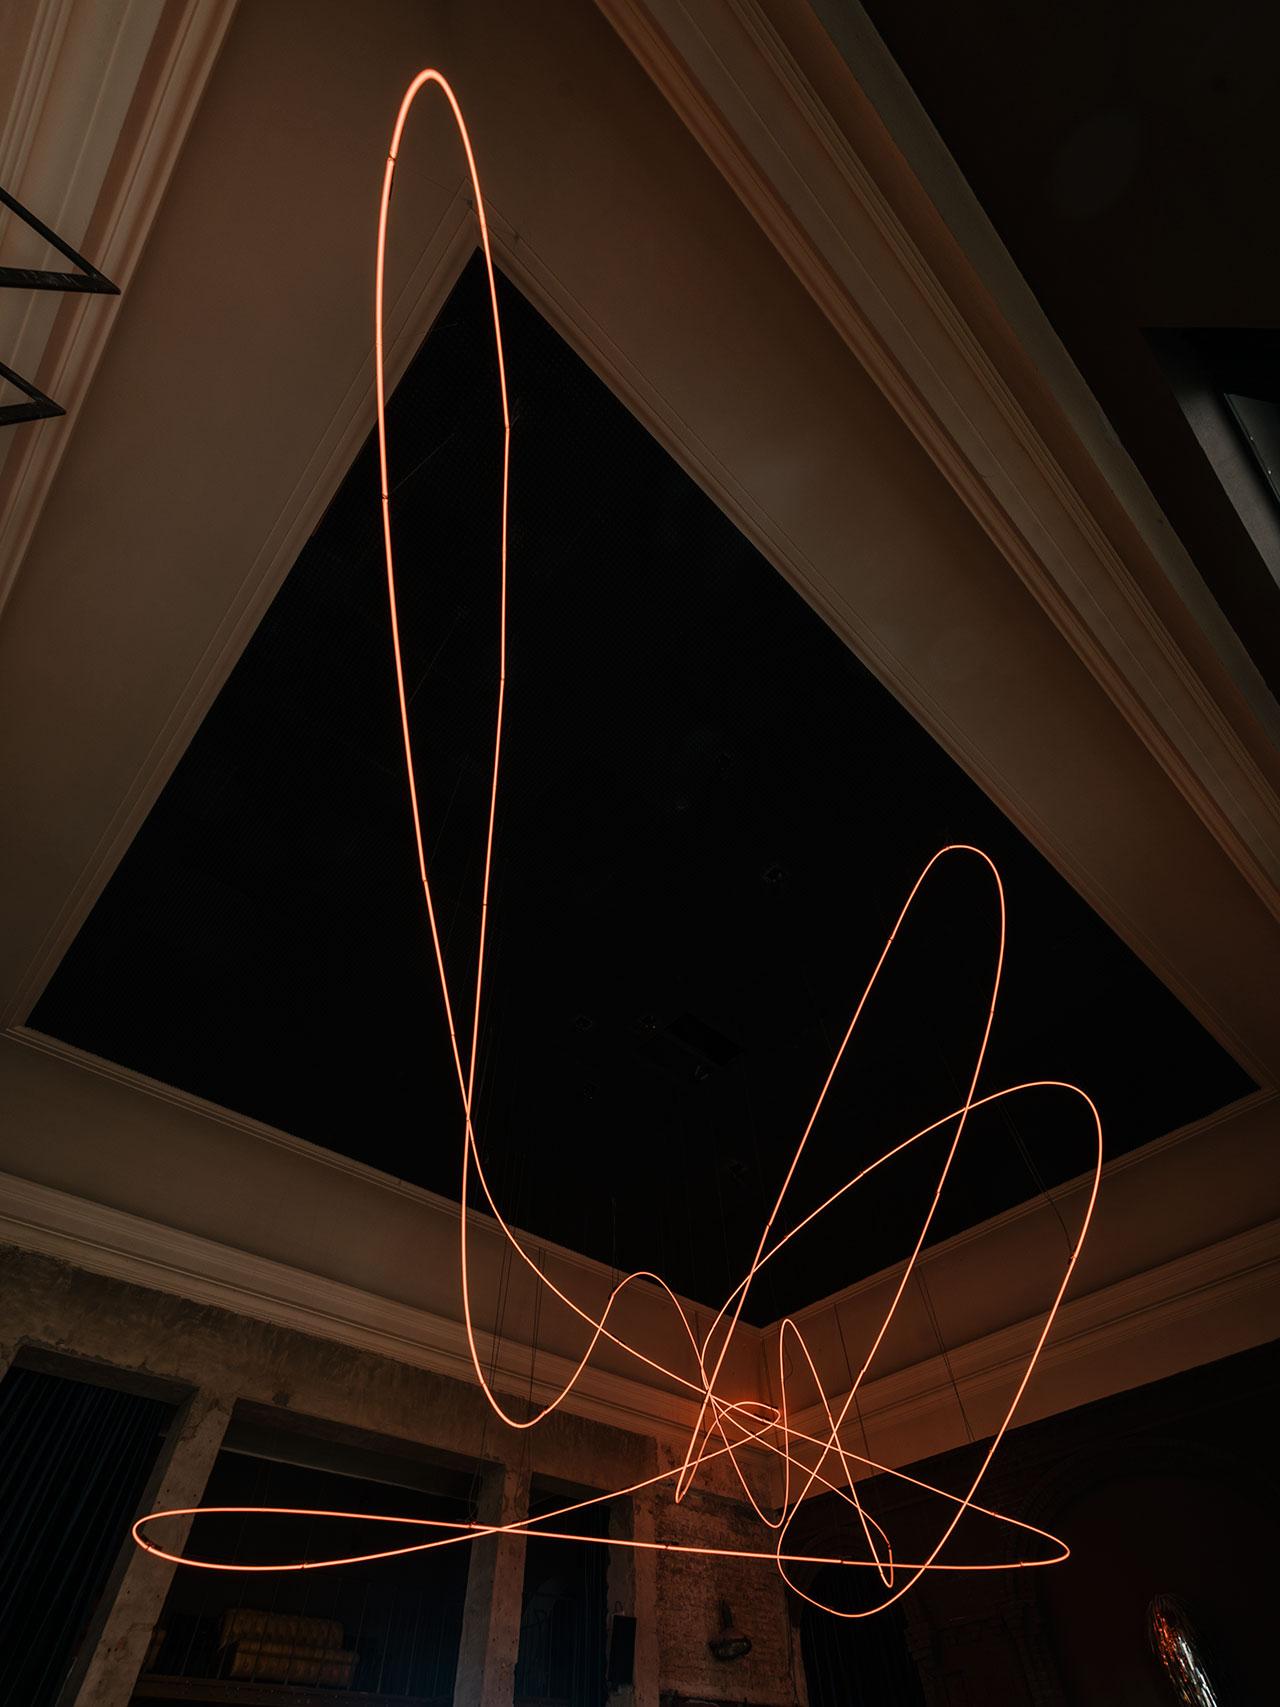 KINK Bar & Restaurant. Light installation byKerimSeiler. Photography by Robert Rieger. Courtesy of Kerim Seiler.